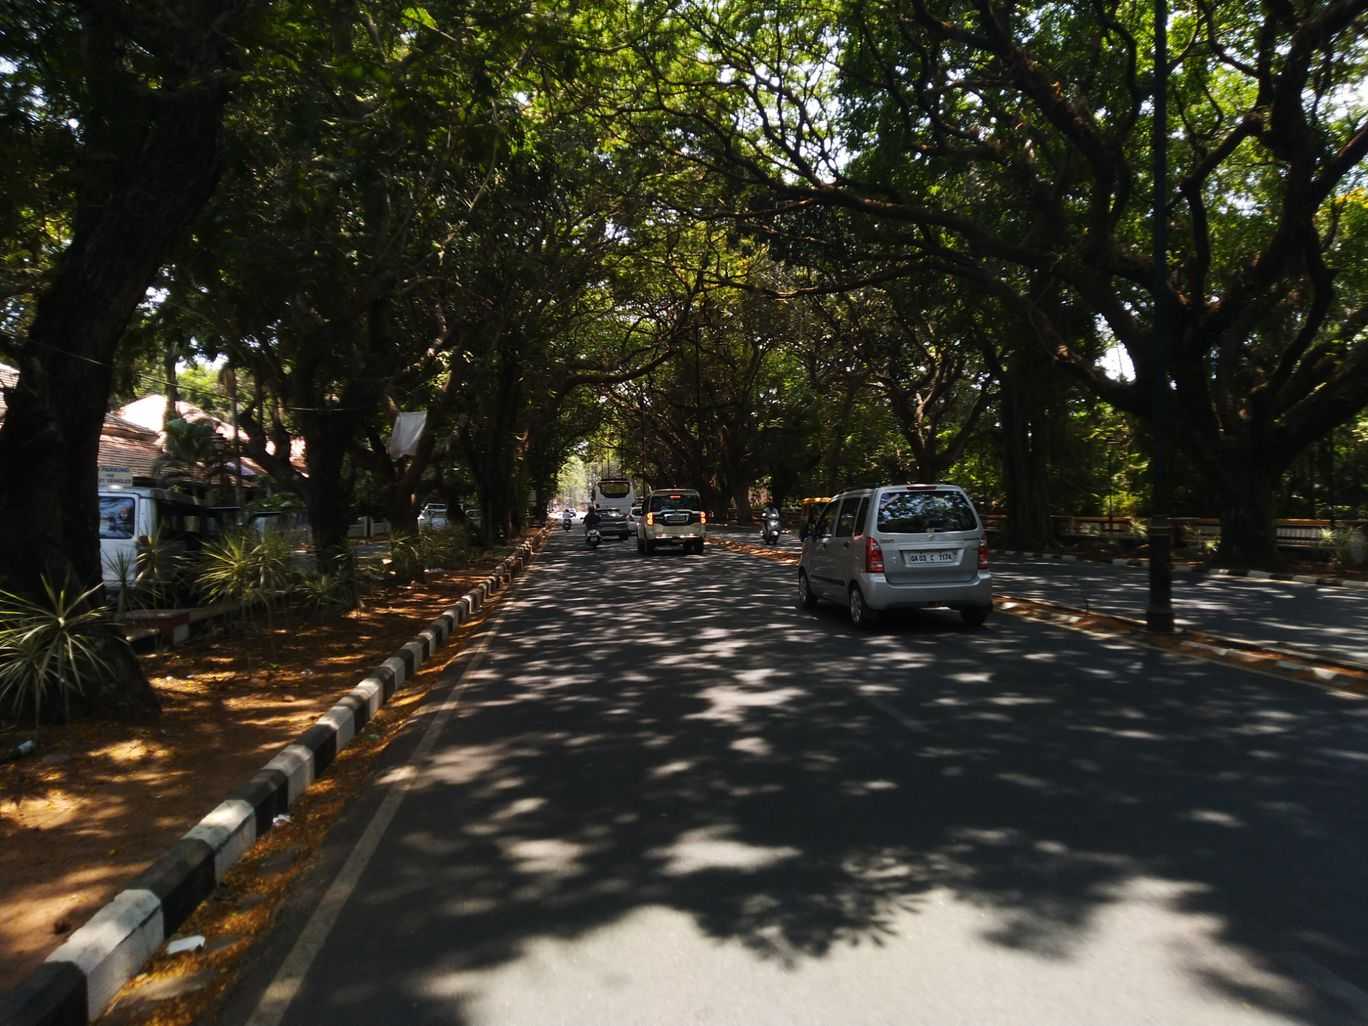 Photo of Goa By Nitesh Trivedi